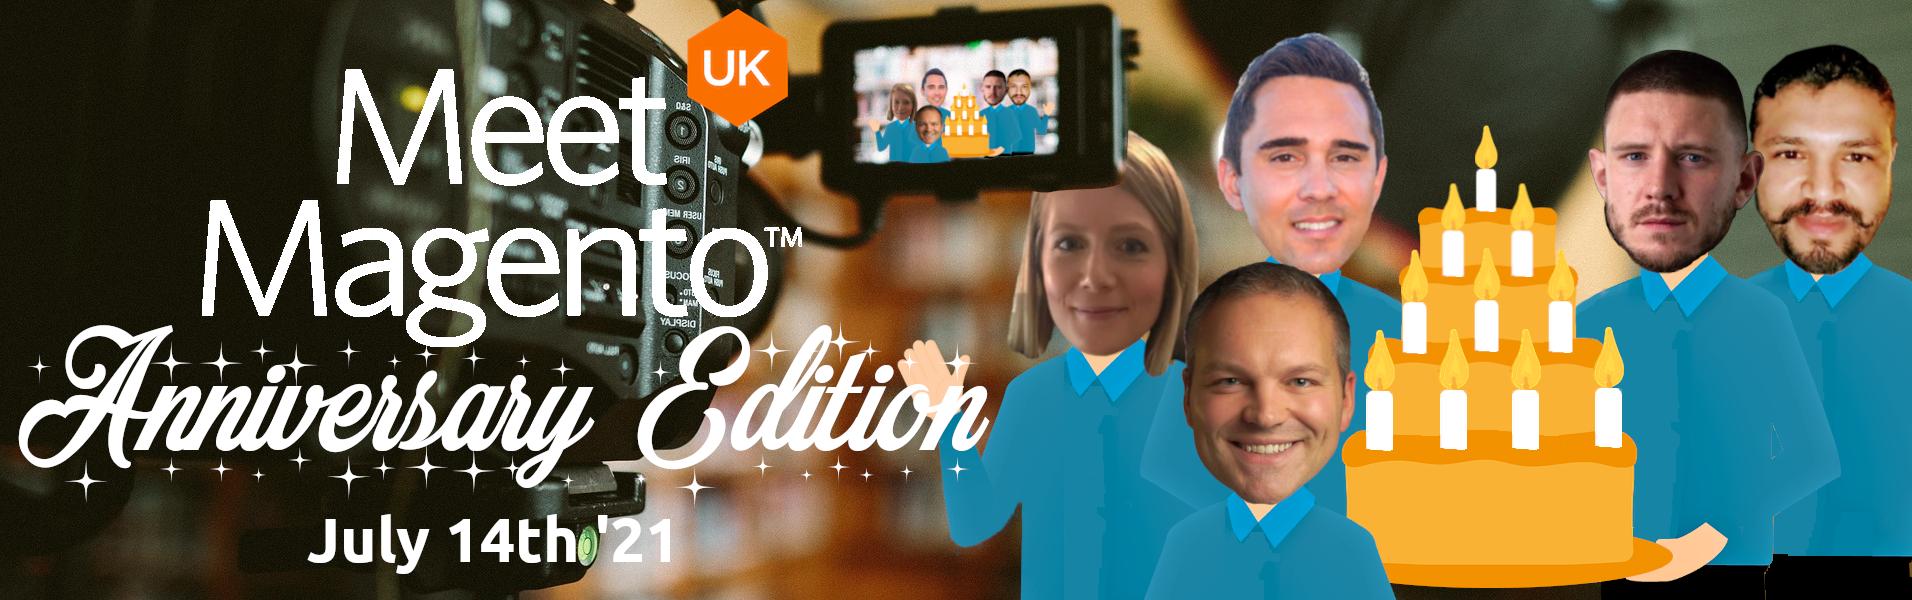 Meet Magento UK '21 - Mark Shust, Paul Cartwright, Tiffany Mills, Matt Serwin & Vikrant Shukla.